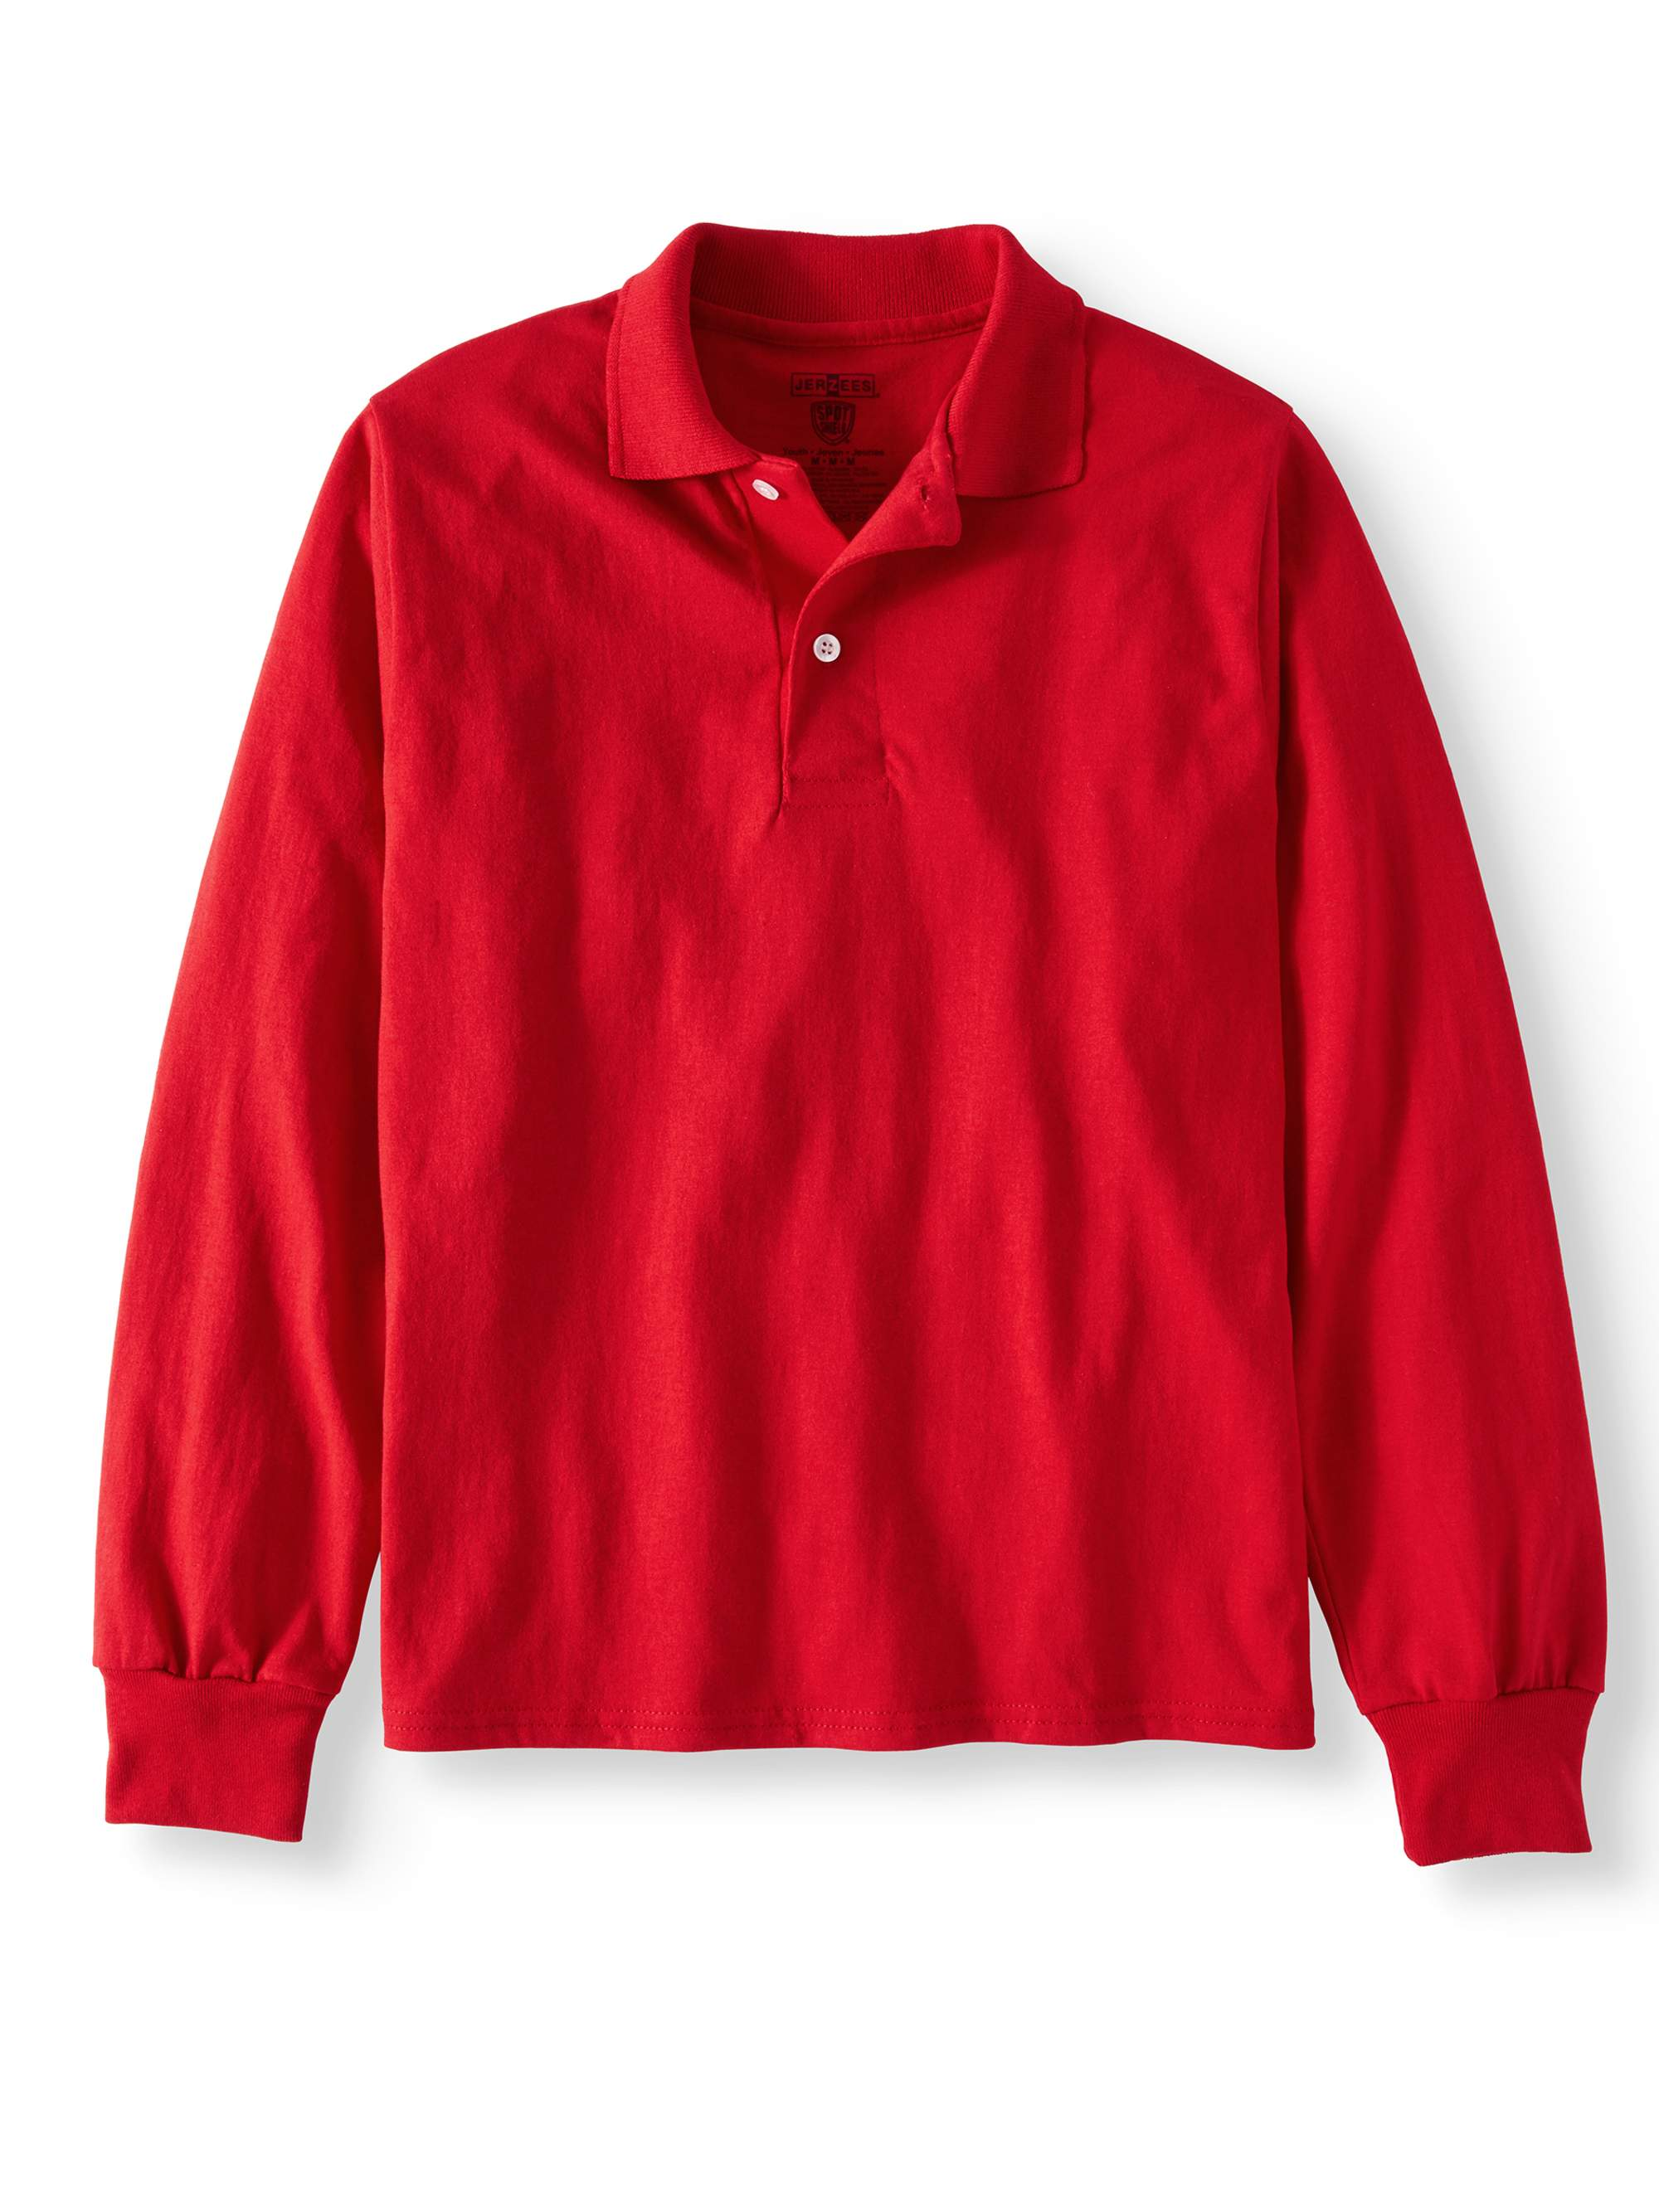 SpotShield Long Sleeve Polo Sport Shirt (Little Boys & Big Boys)